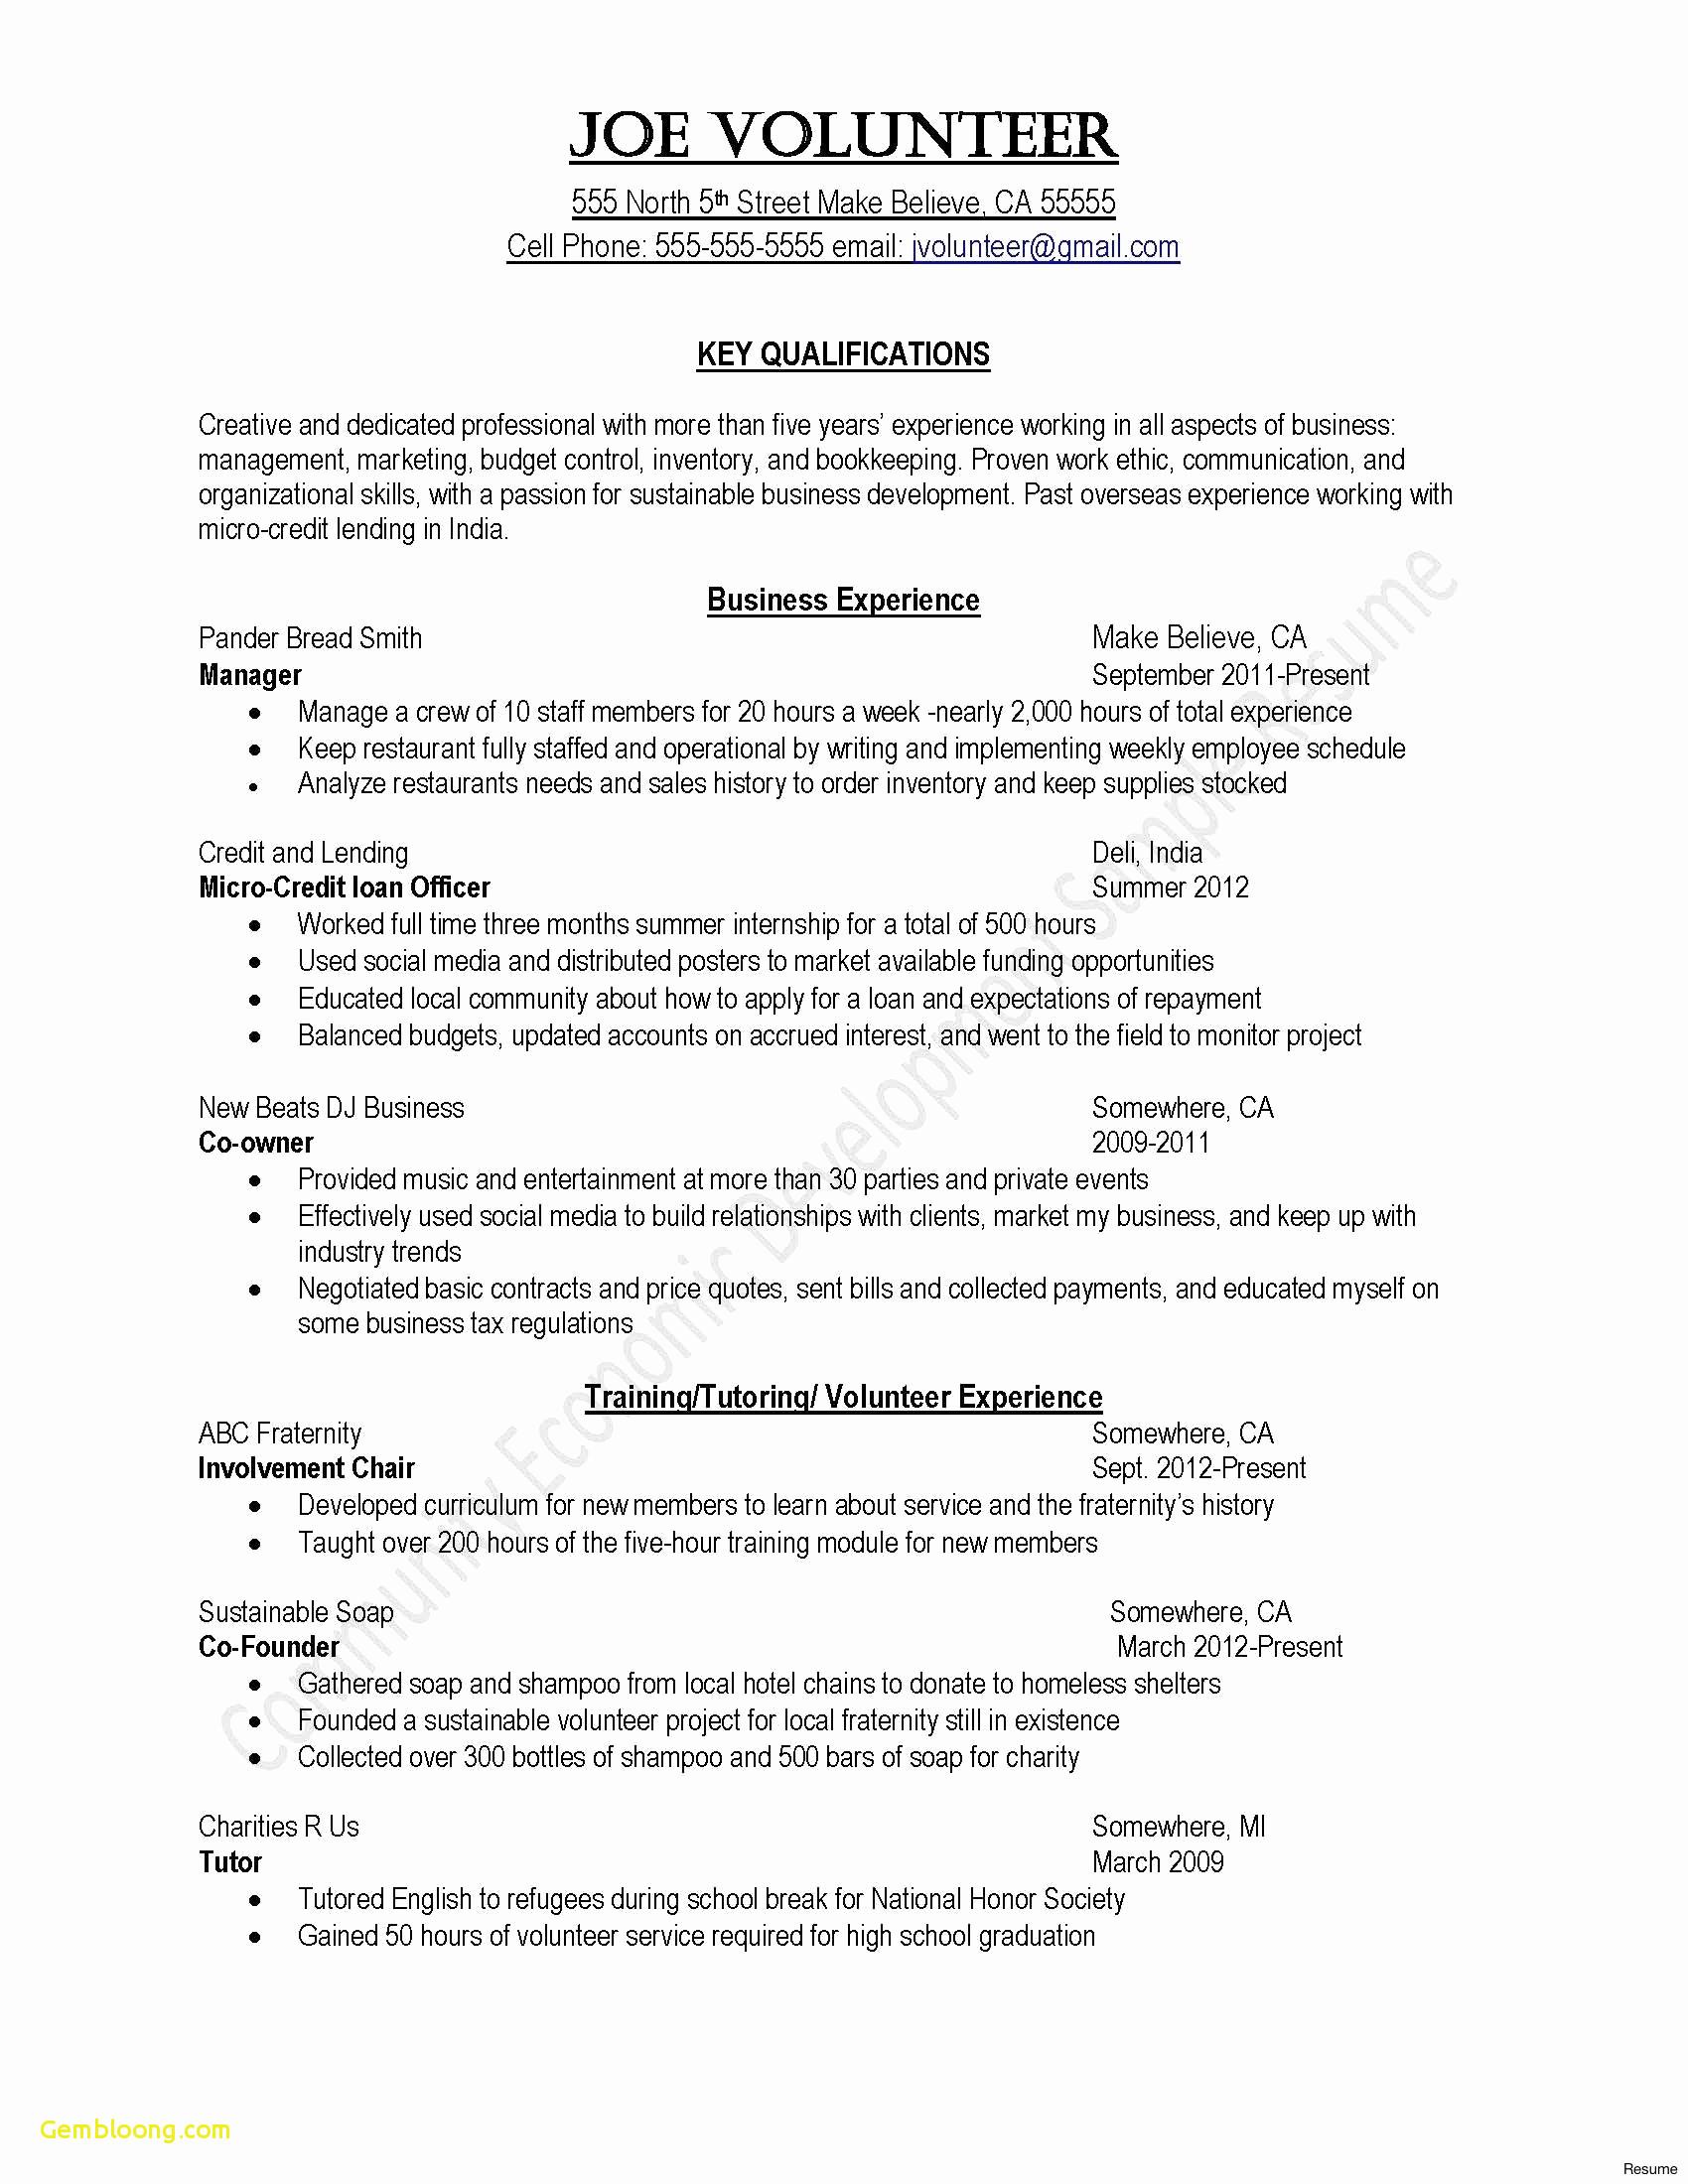 Business Presentation Letter Template - Best Business Resume Template New format Cover Letter for Resume